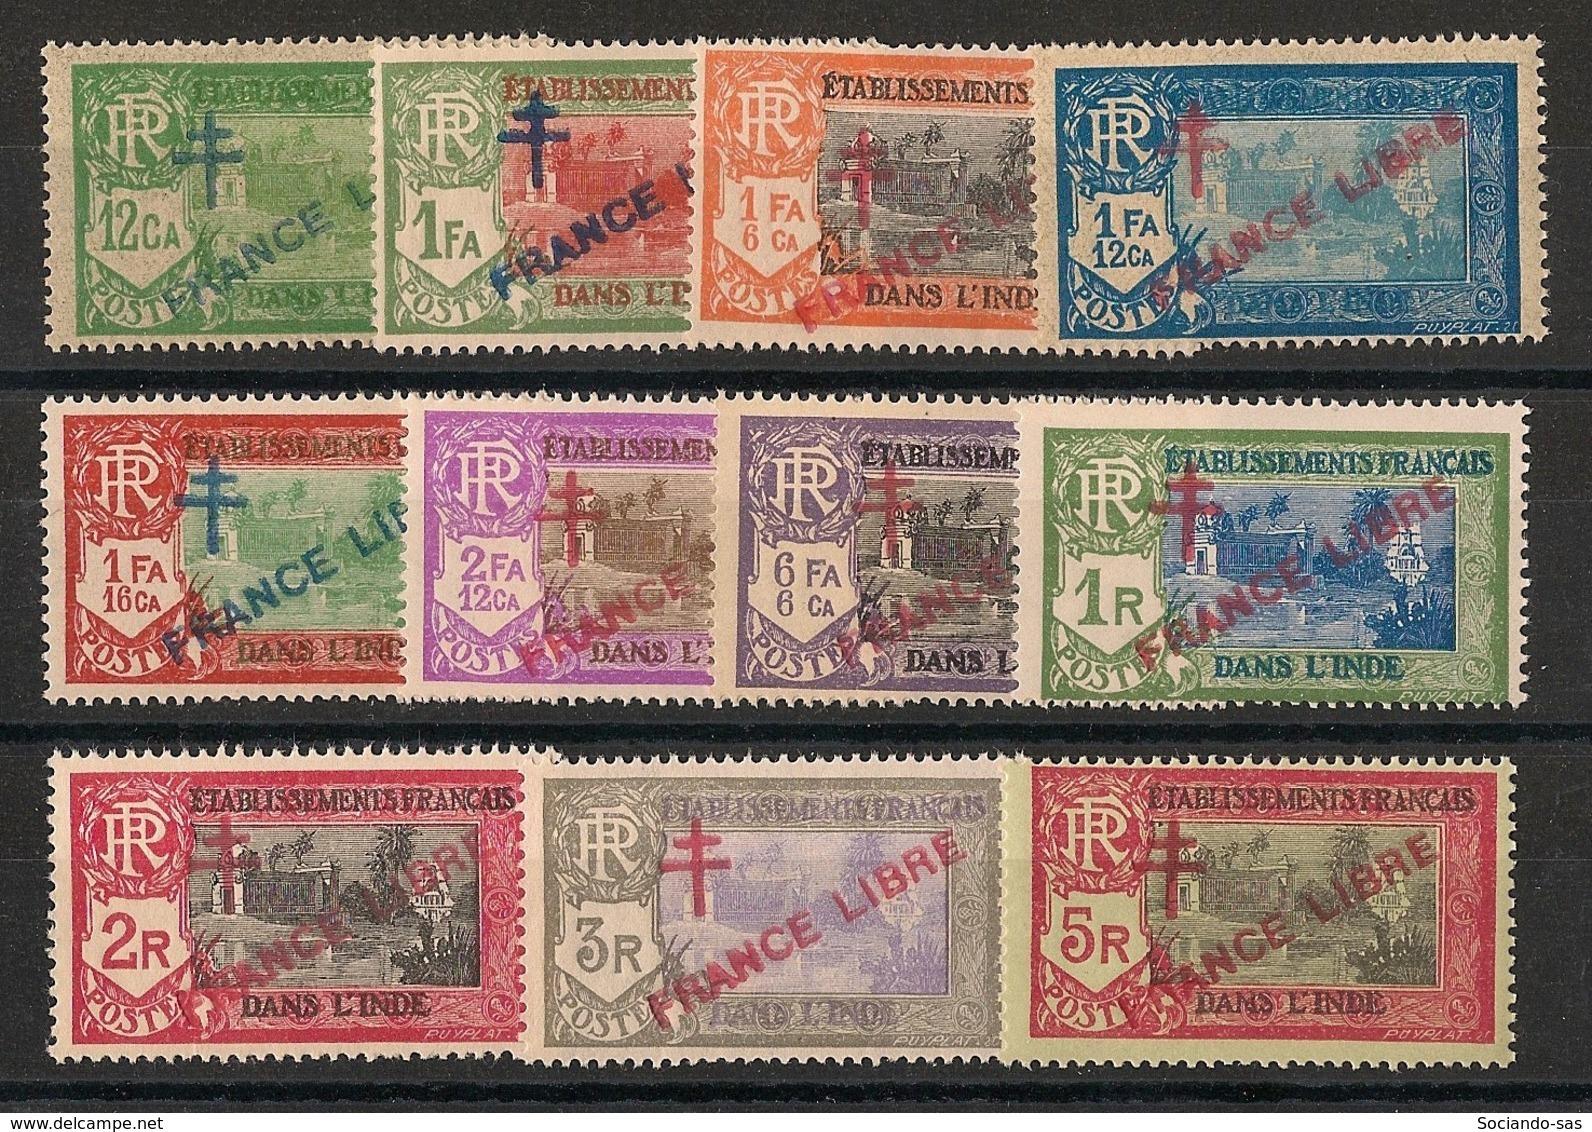 Inde - 1941-43 - N°Yv. 160 à 170 - France Libre - Série Complète - Neuf Luxe ** / MNH / Postfrisch - Ungebraucht